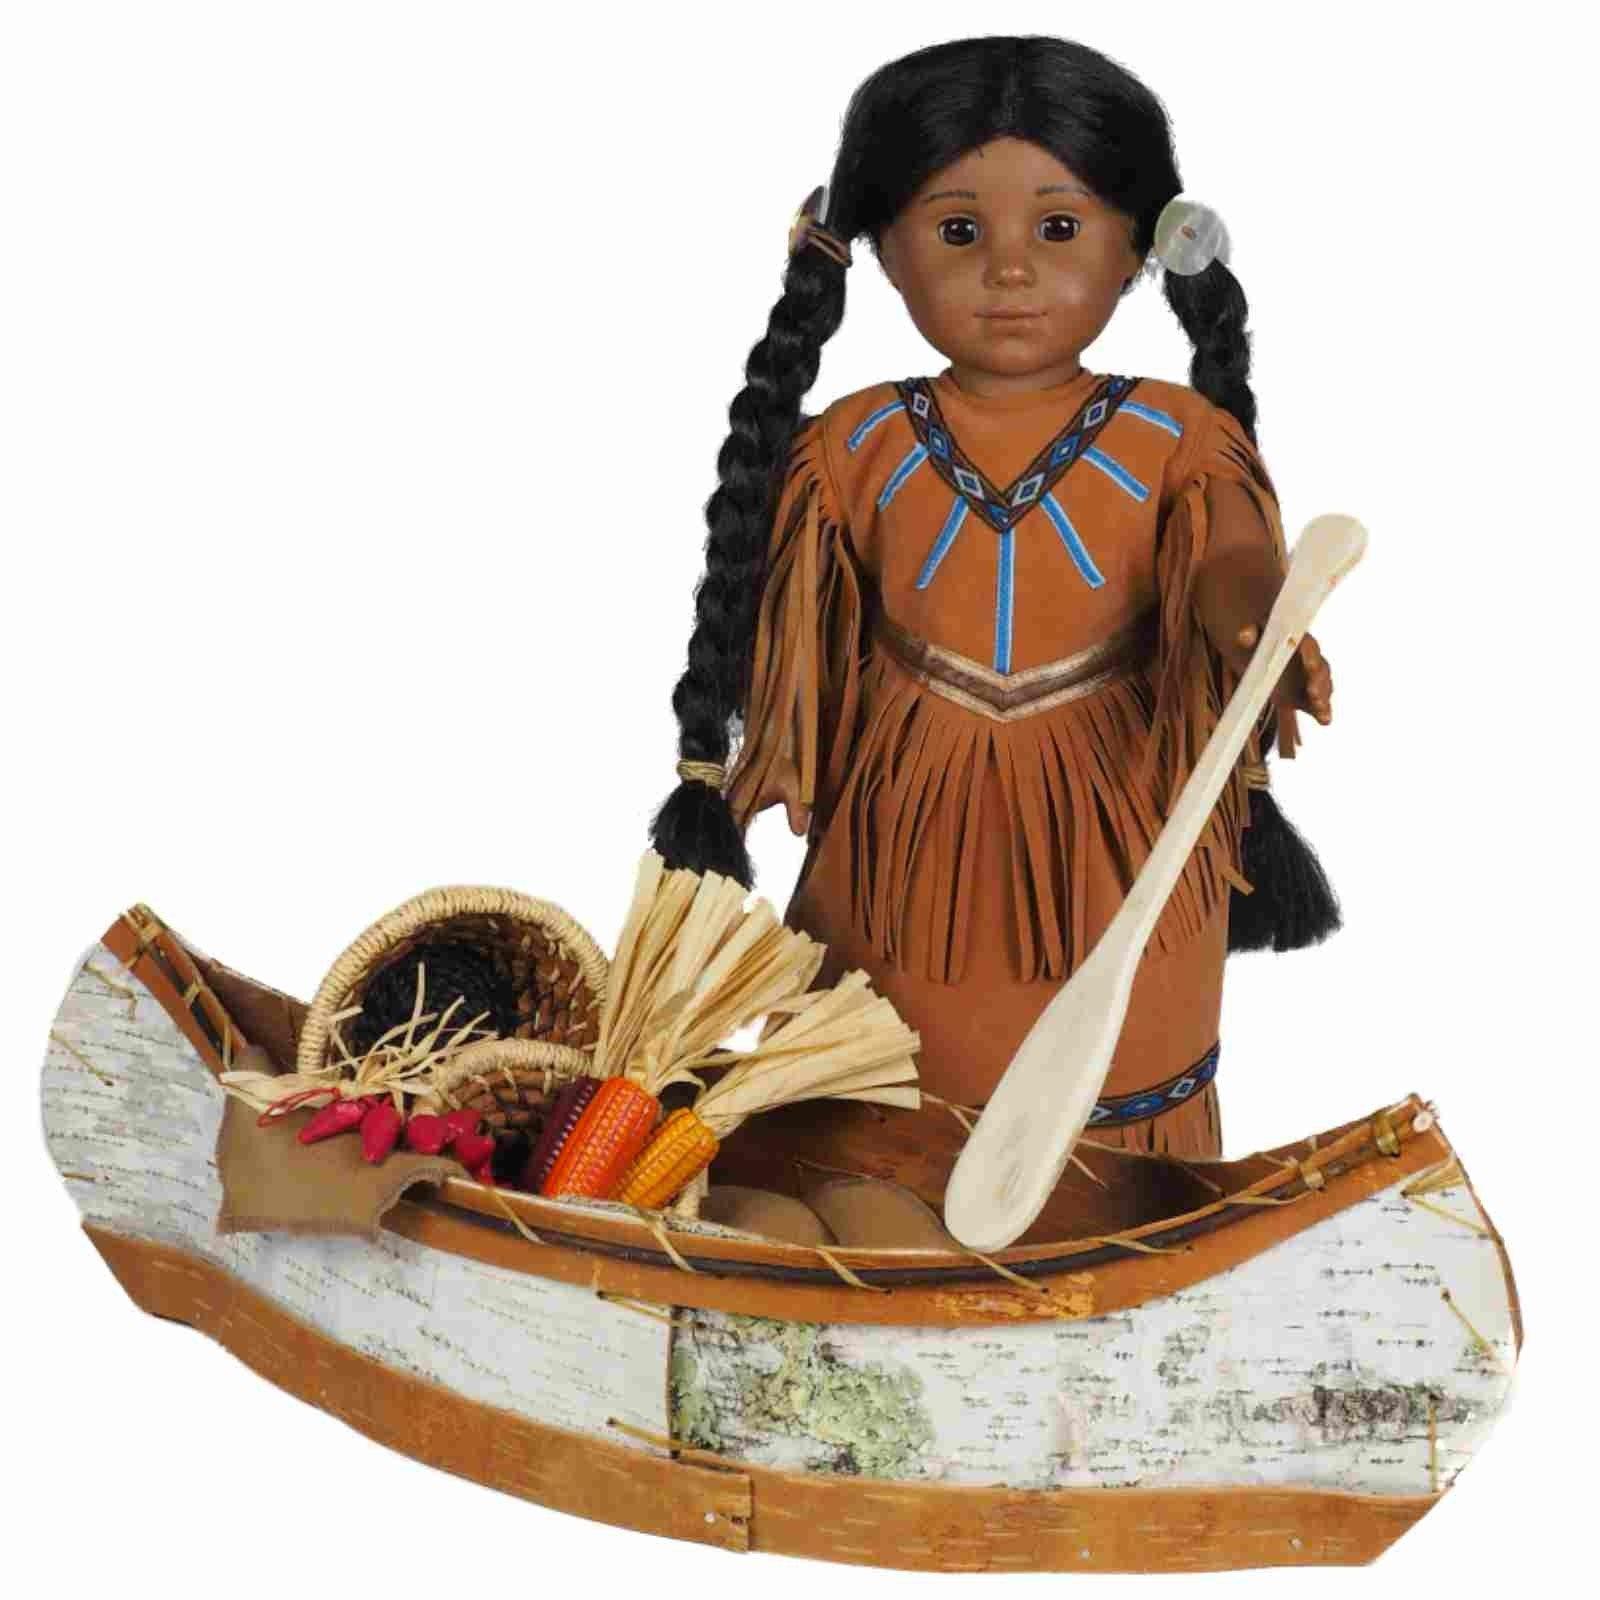 Native American Heritage Canoe For 18 American Girl